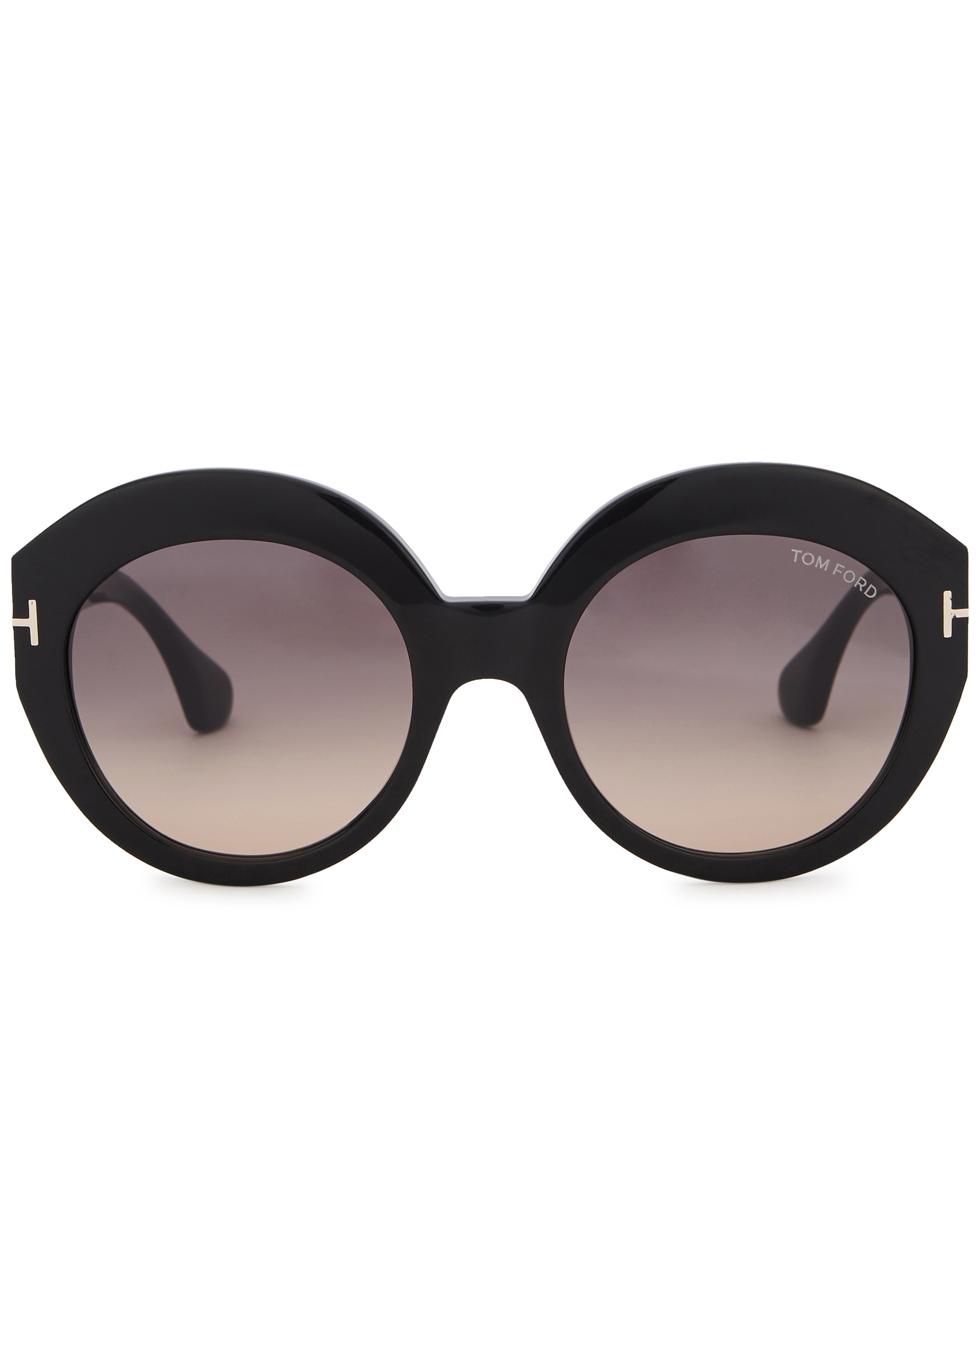 Rachel black round-frame sunglasses - Tom Ford Eyewear